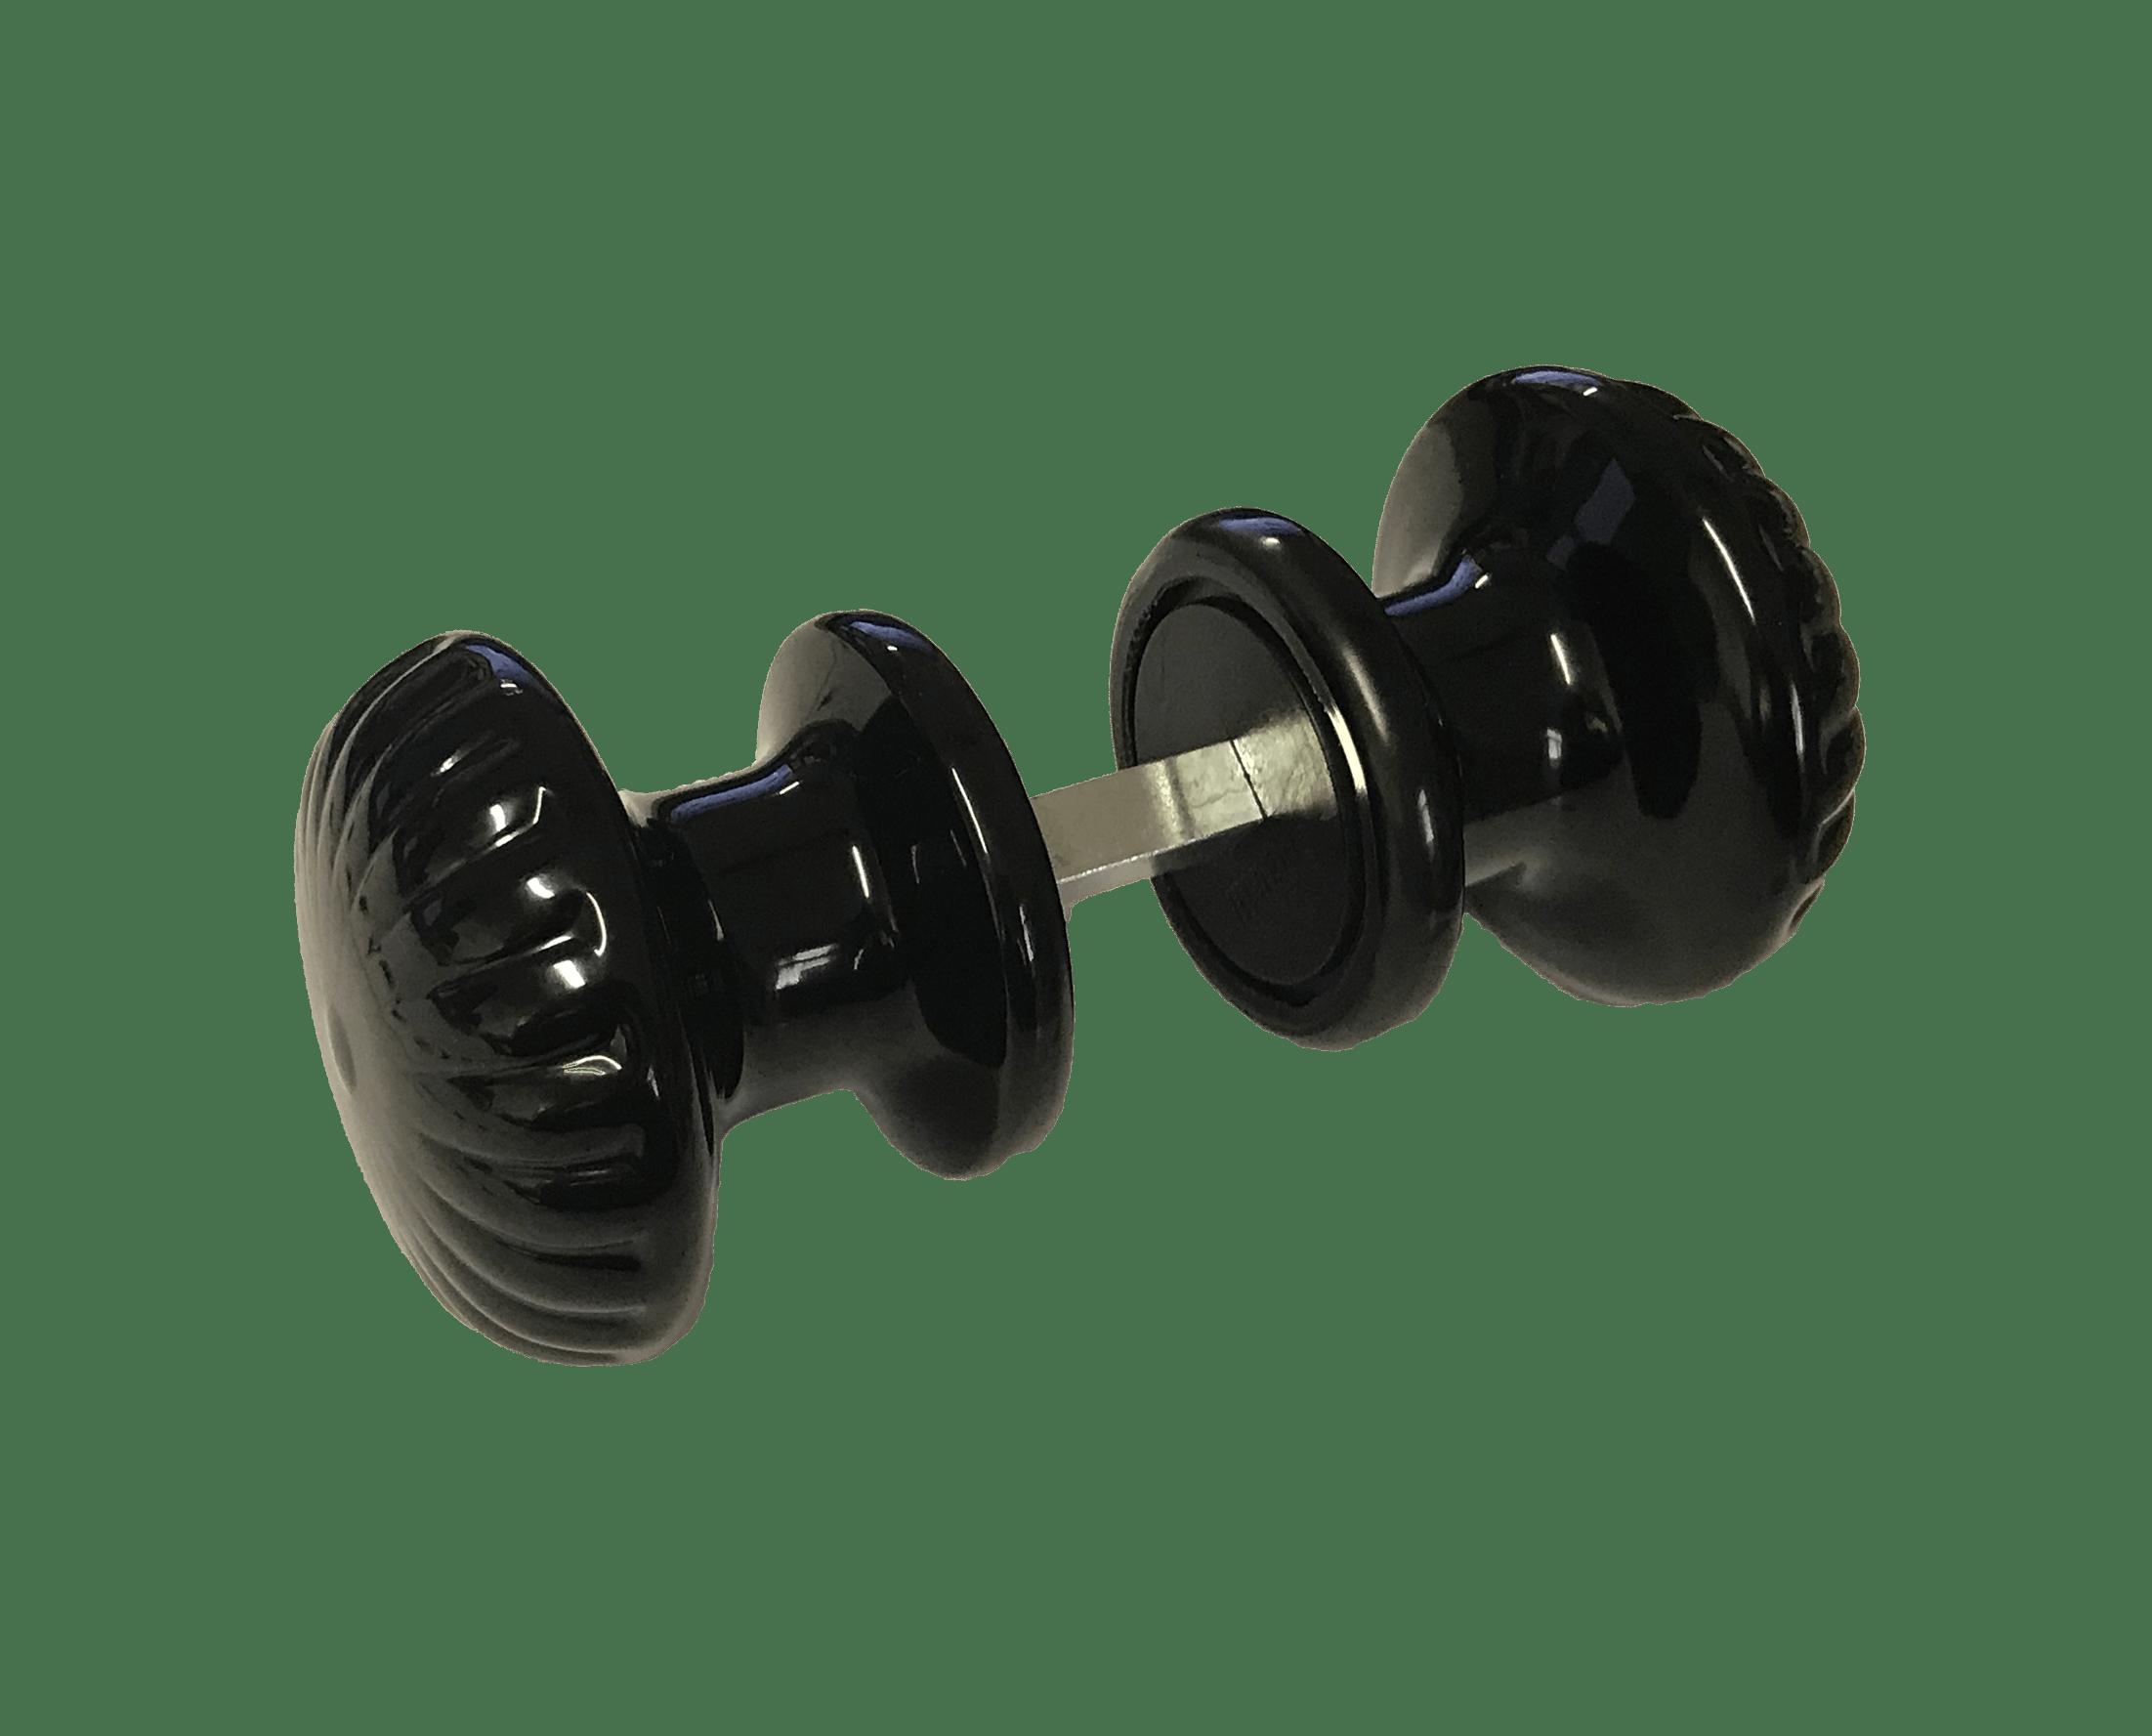 powder coated aluminum knobs